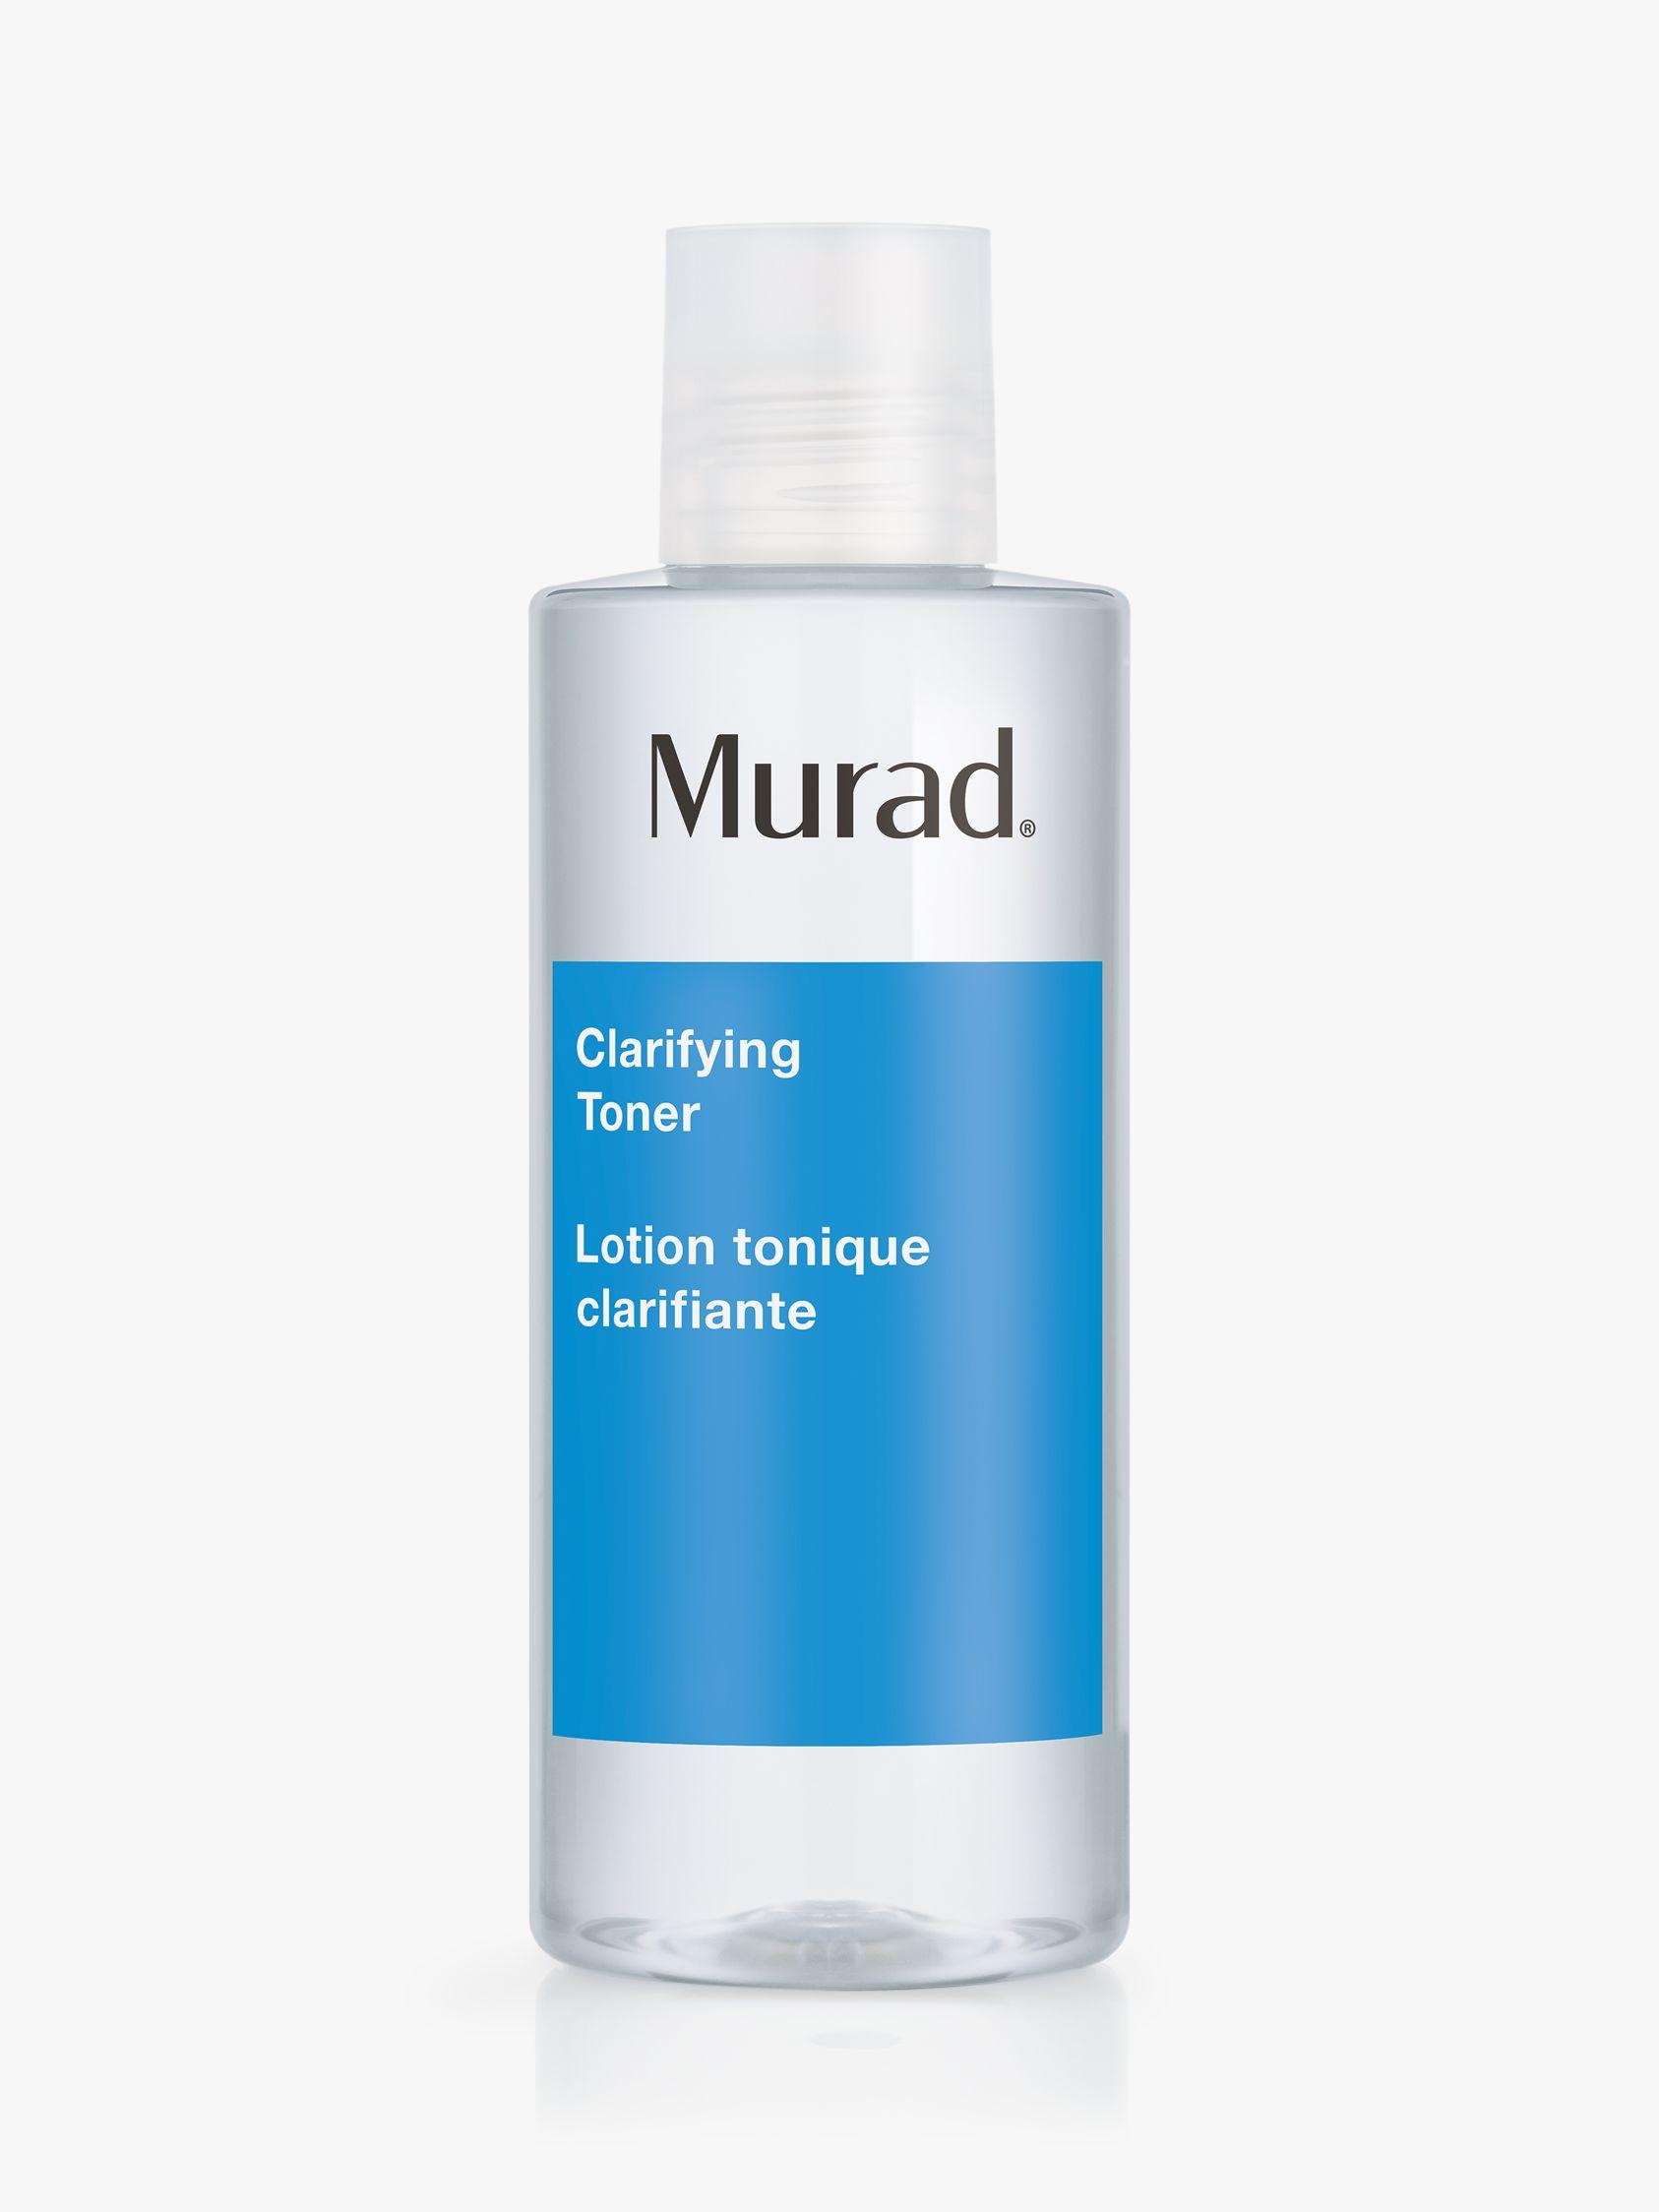 Murad Murad Clarifying Toner, 180ml